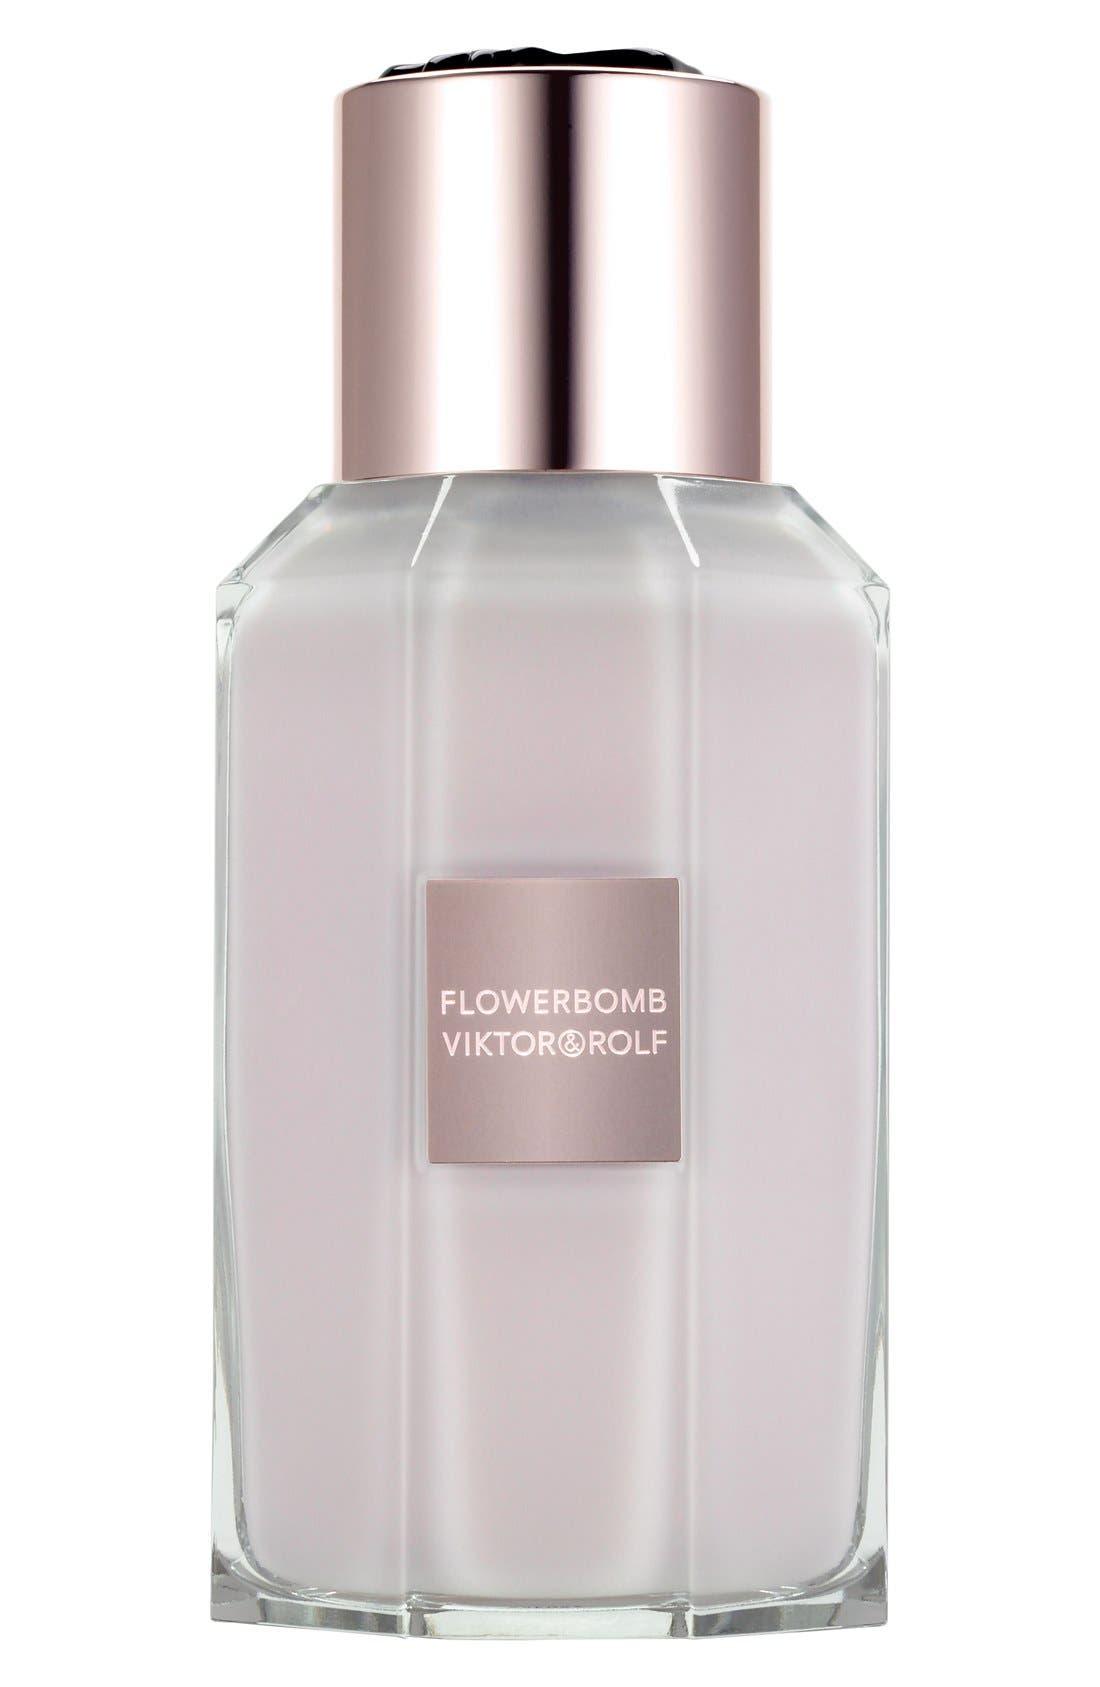 Viktor&Rolf 'Flowerbomb' Foaming Bath